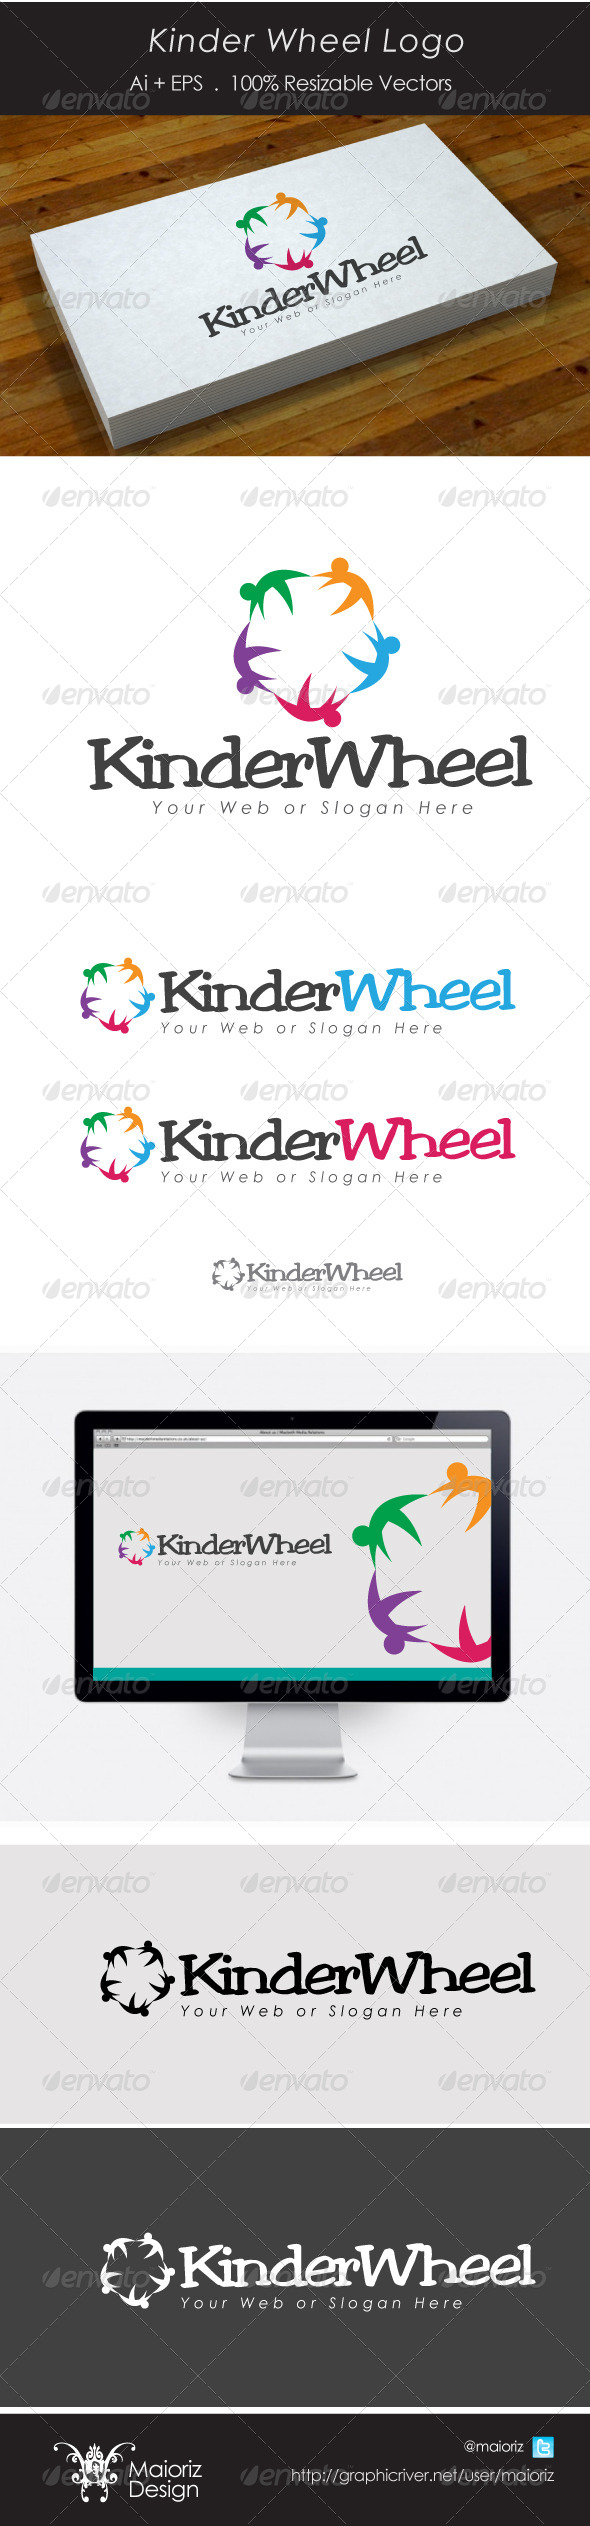 Kinder Wheel Logo - Vector Abstract